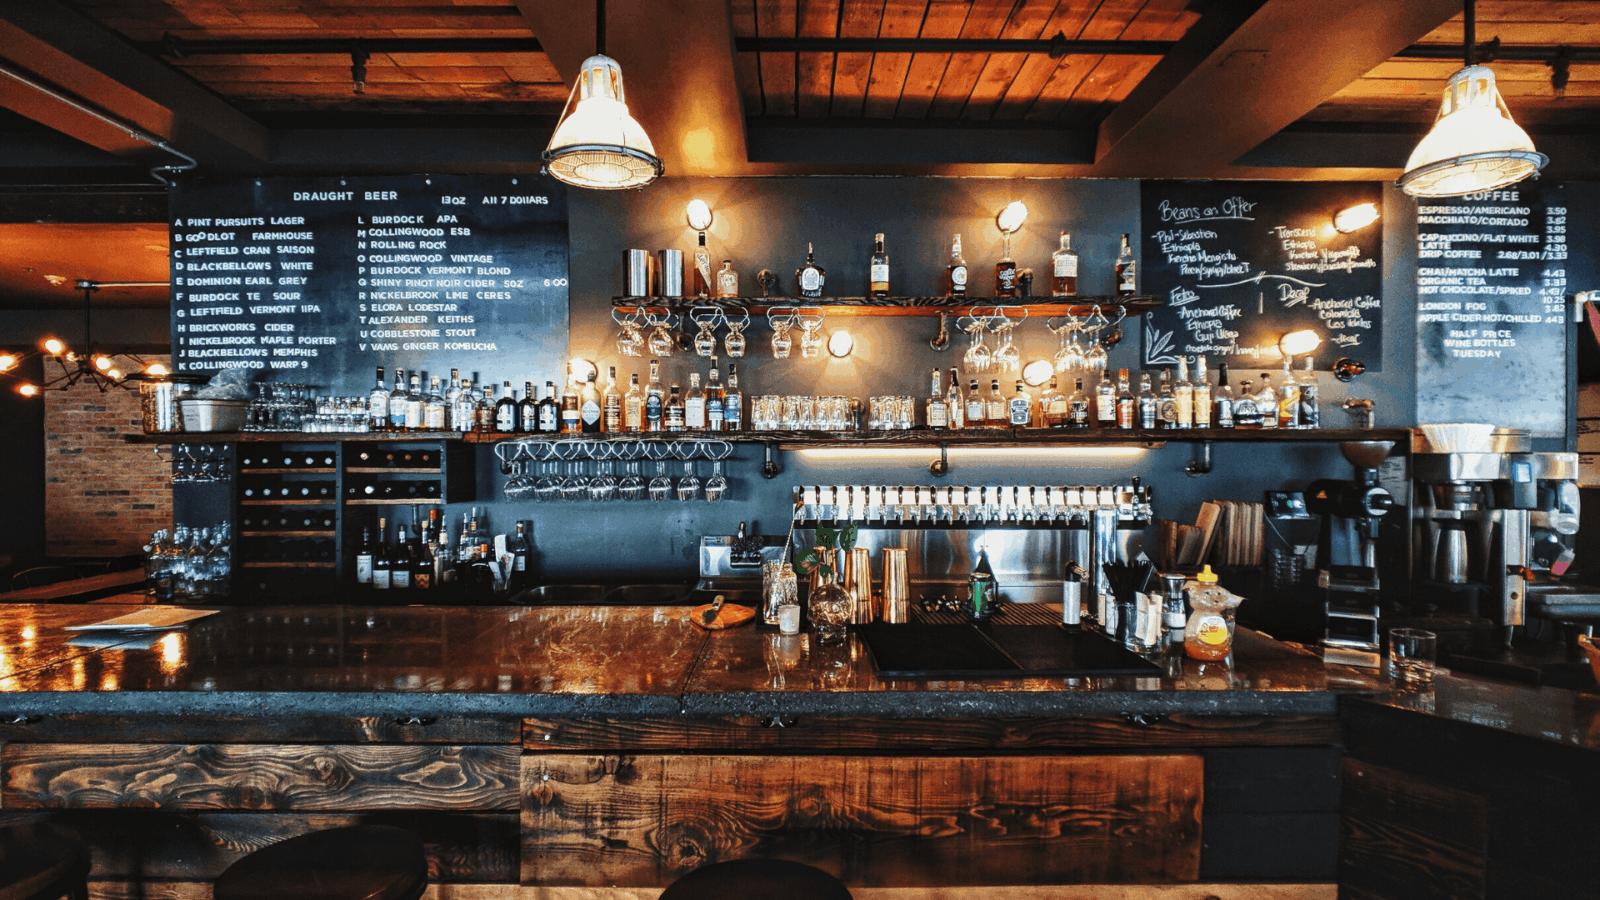 10 Examples Of Killer Bar Menu Design Ideas On The Line Toast Pos